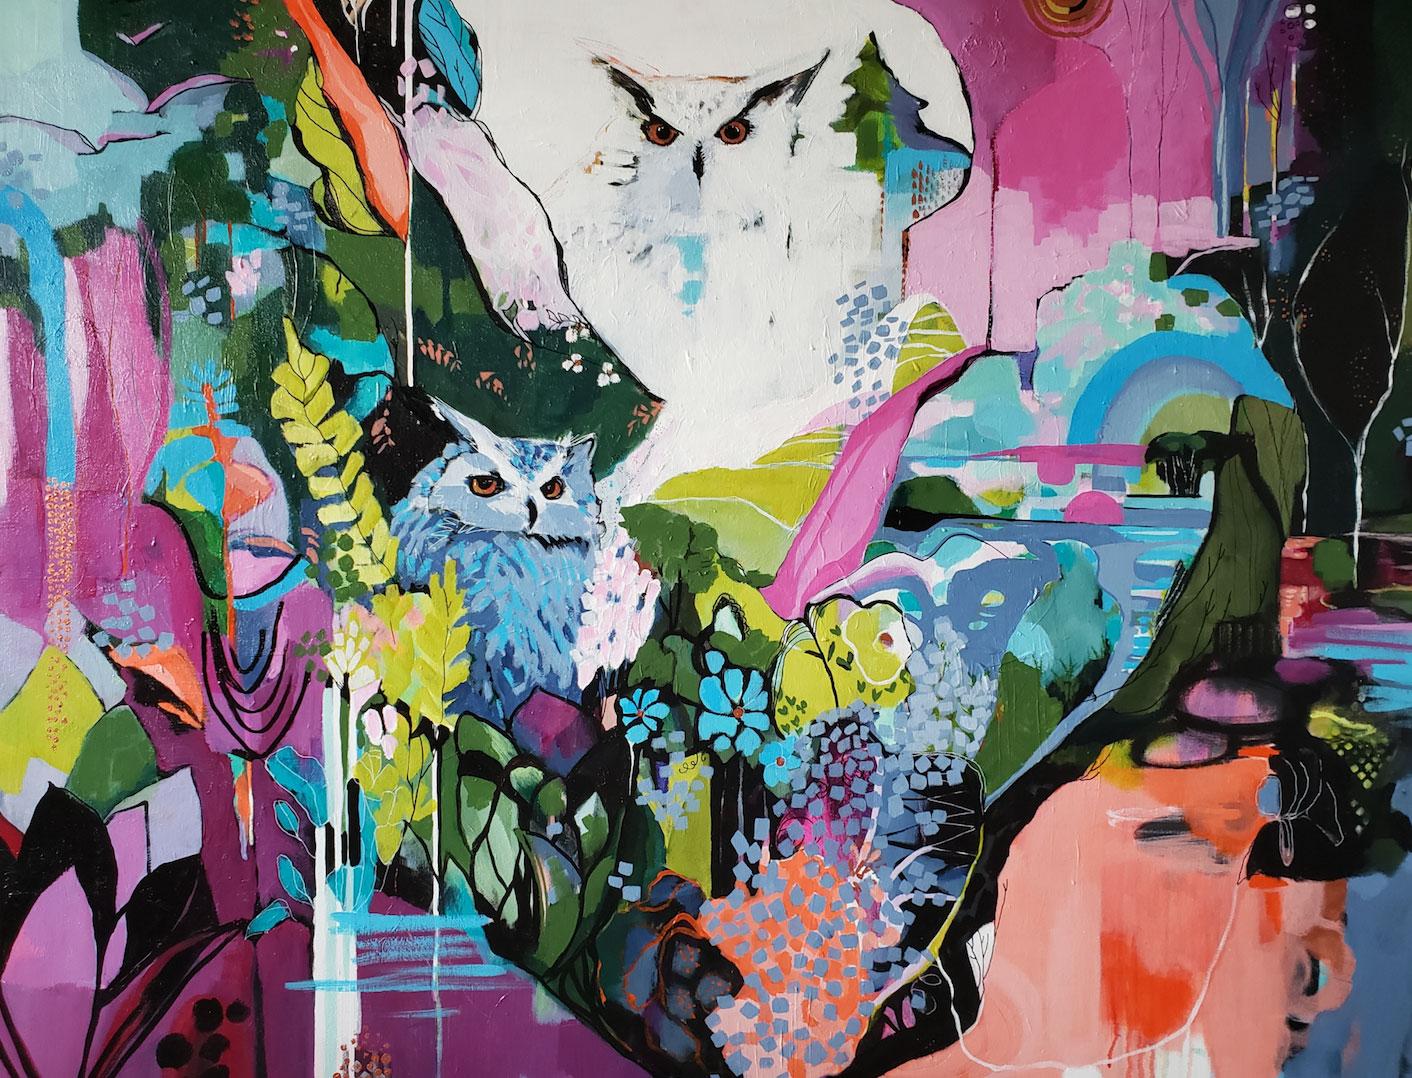 By Linda Briggs